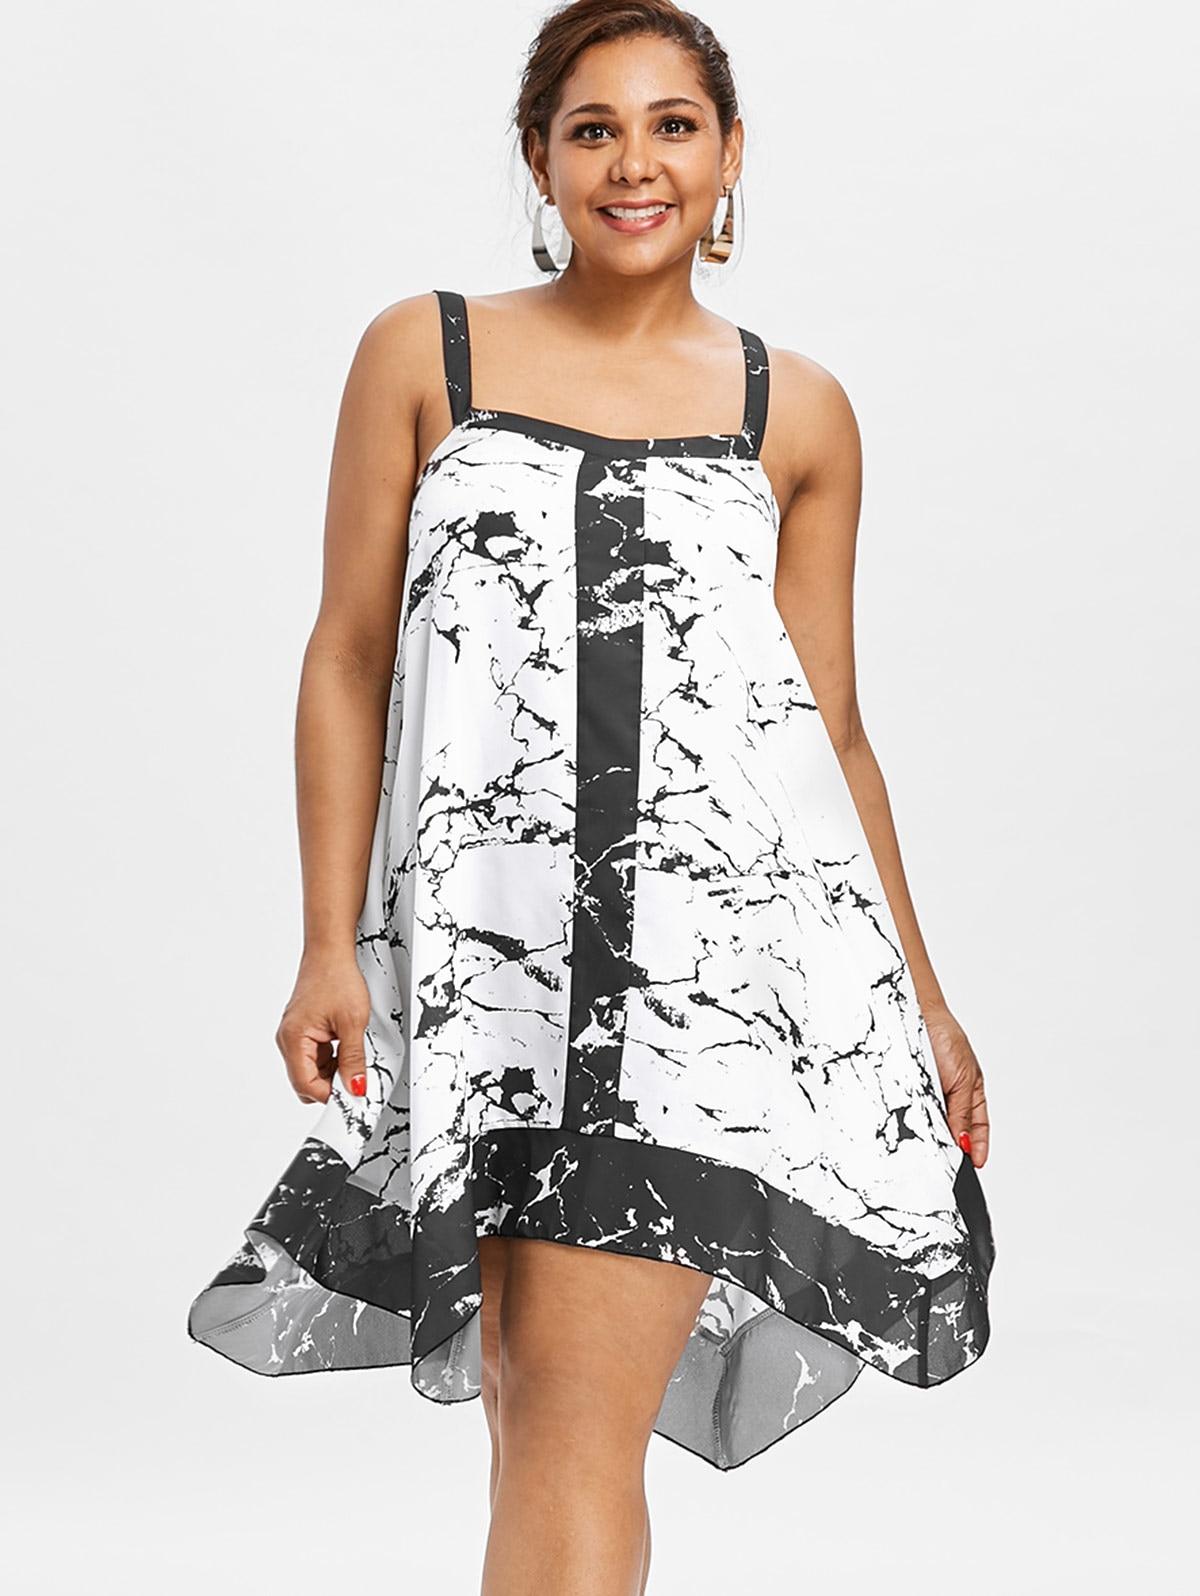 e5b07e600824f AZULINA Plus Size Marble Pattern Asymmetrical Dress Sweetheart Neck  Sleeveless Mini Dresses Summer Loose Women Dress Vestidos